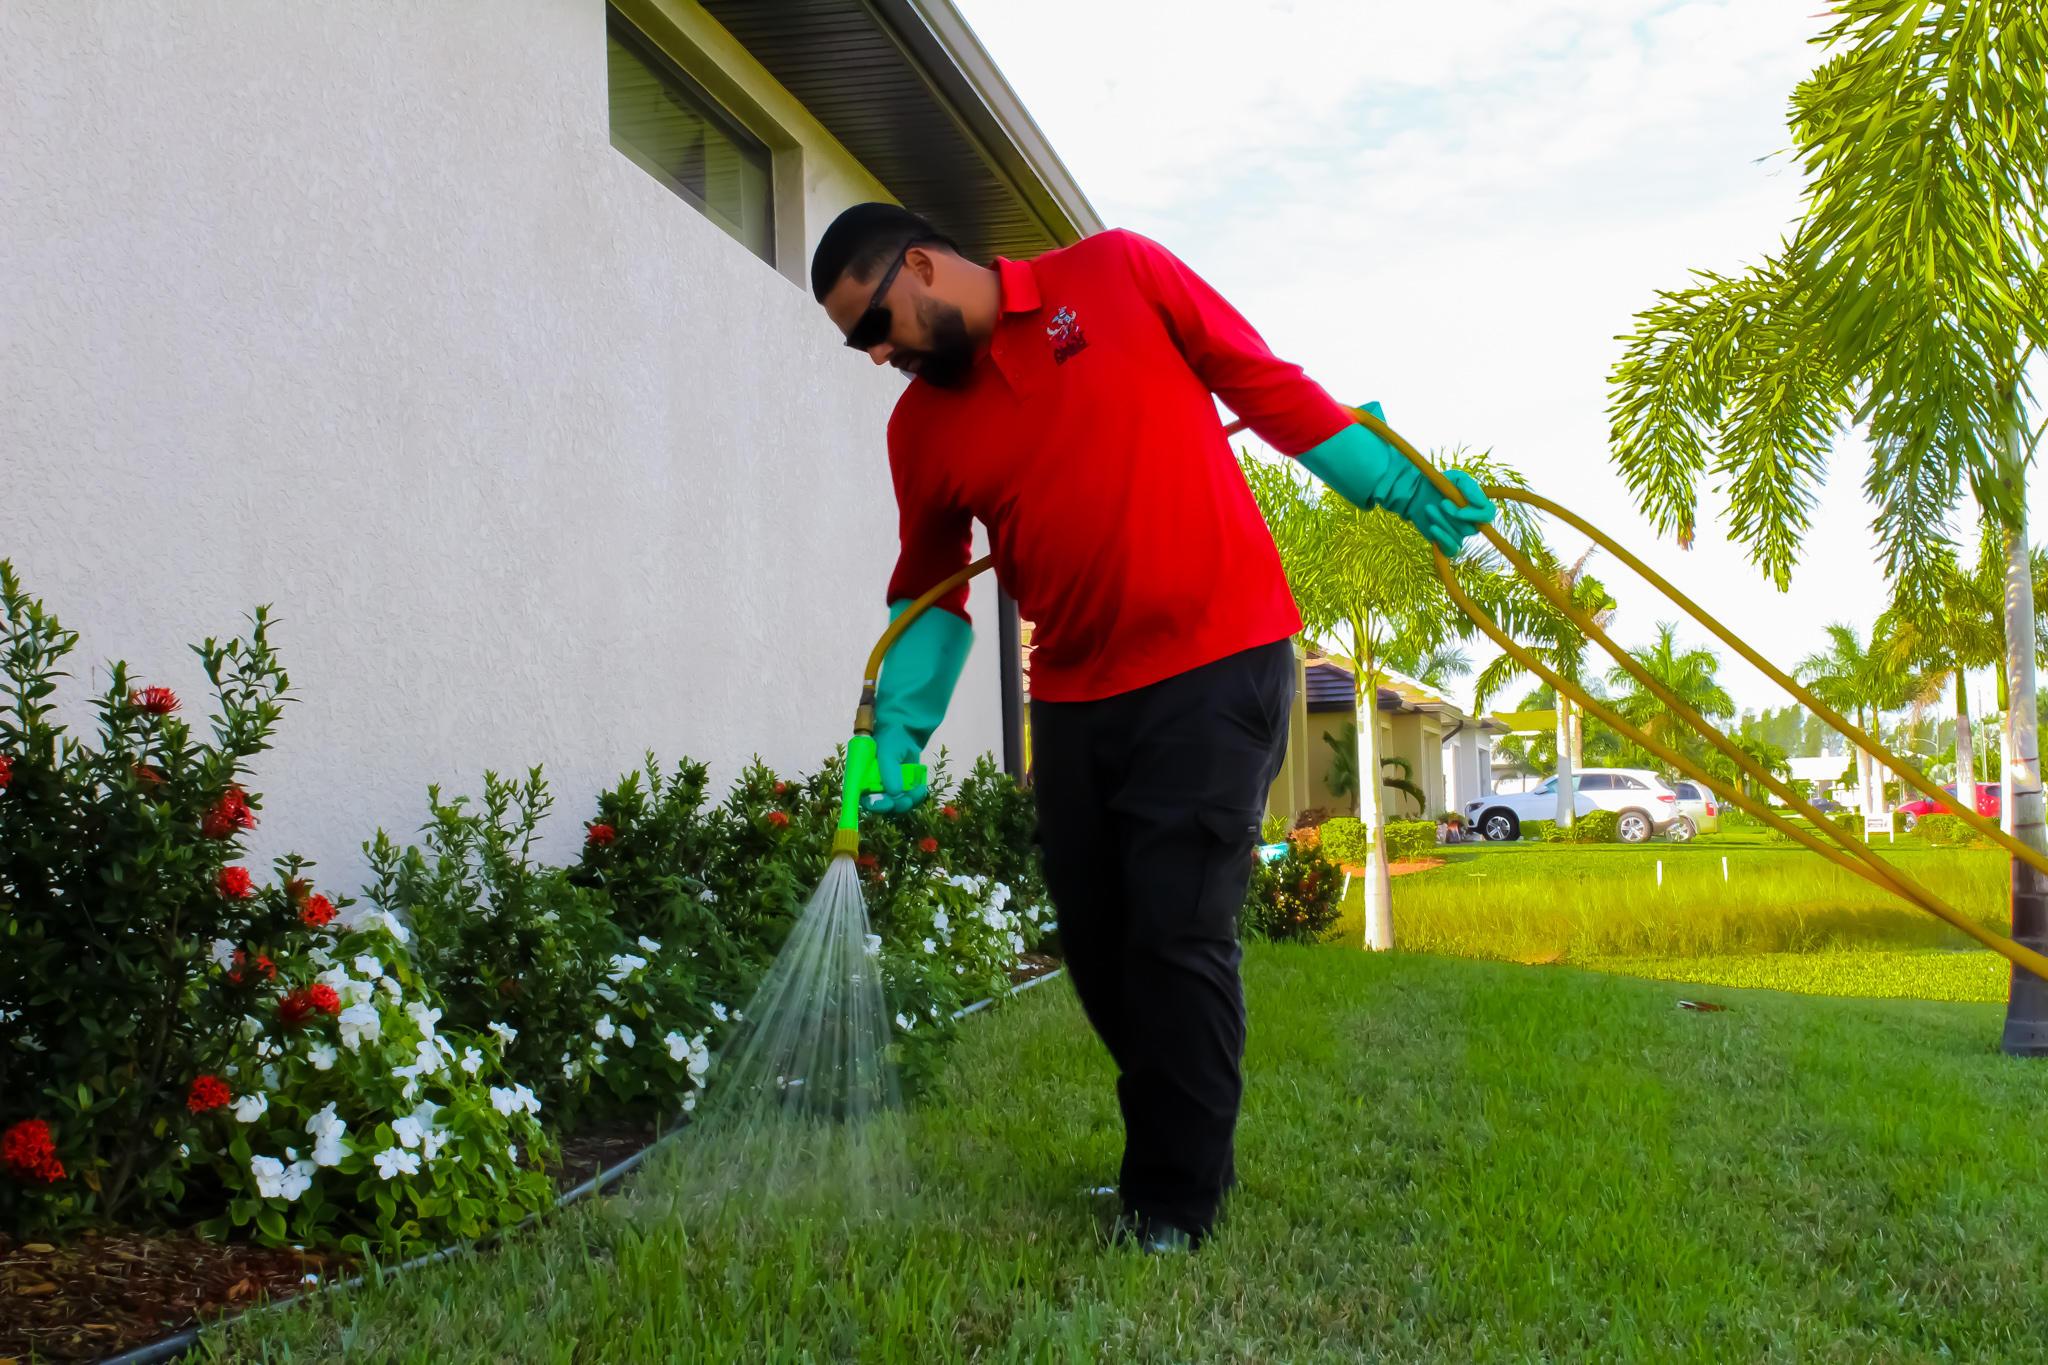 All U Need Pest Control Inc.